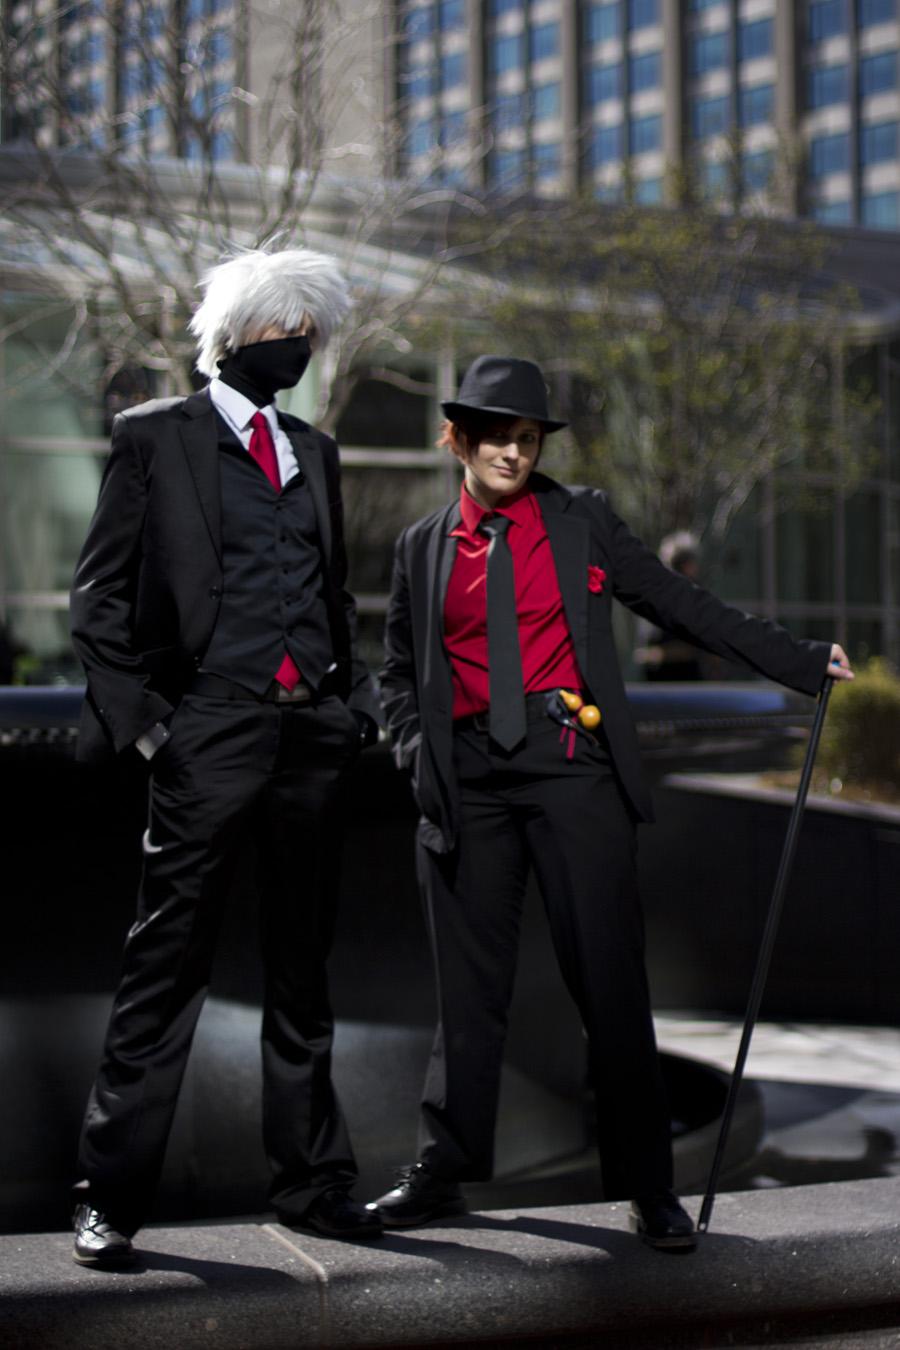 Classy gentlemen by Suki-Cosplay